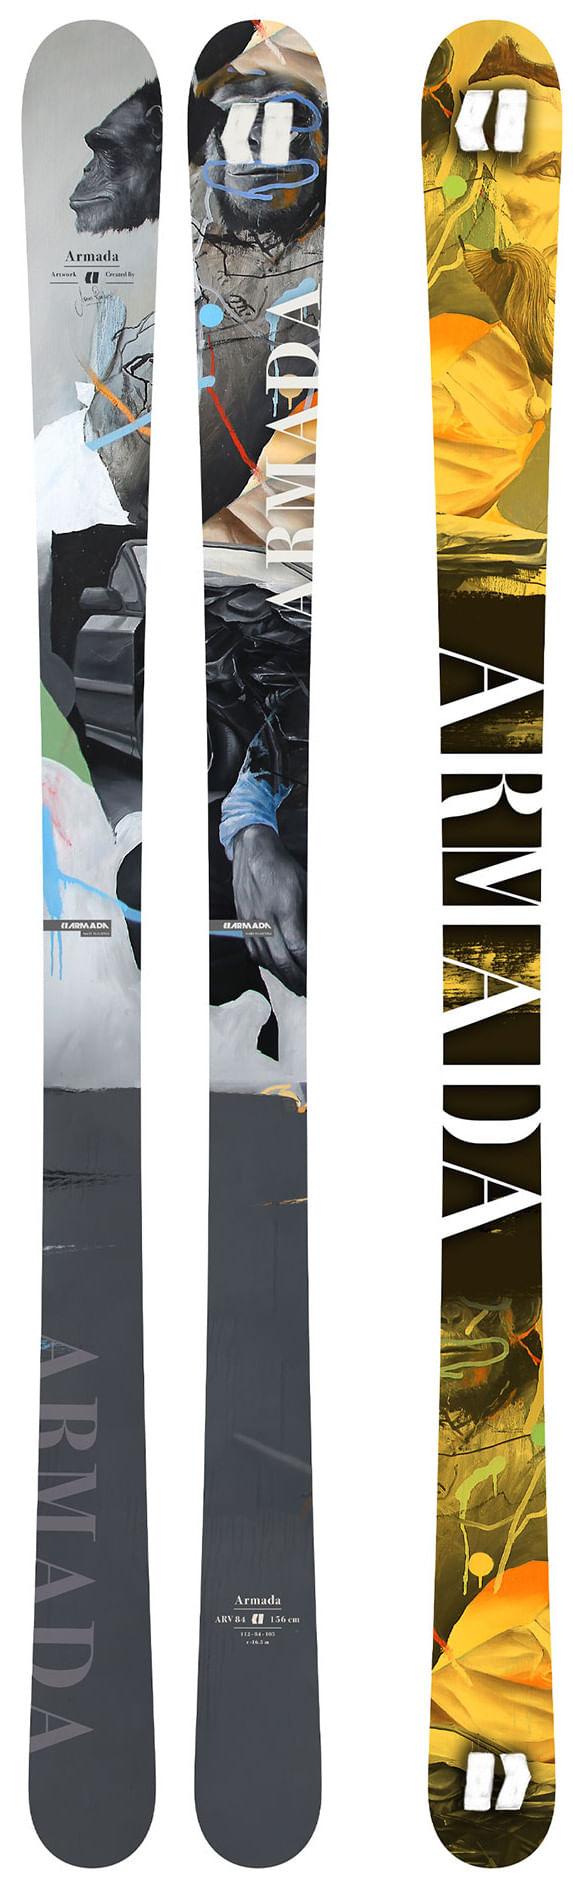 Armada-ARV-84-Ski-With-EM10-GripWalk-Bindings-2021